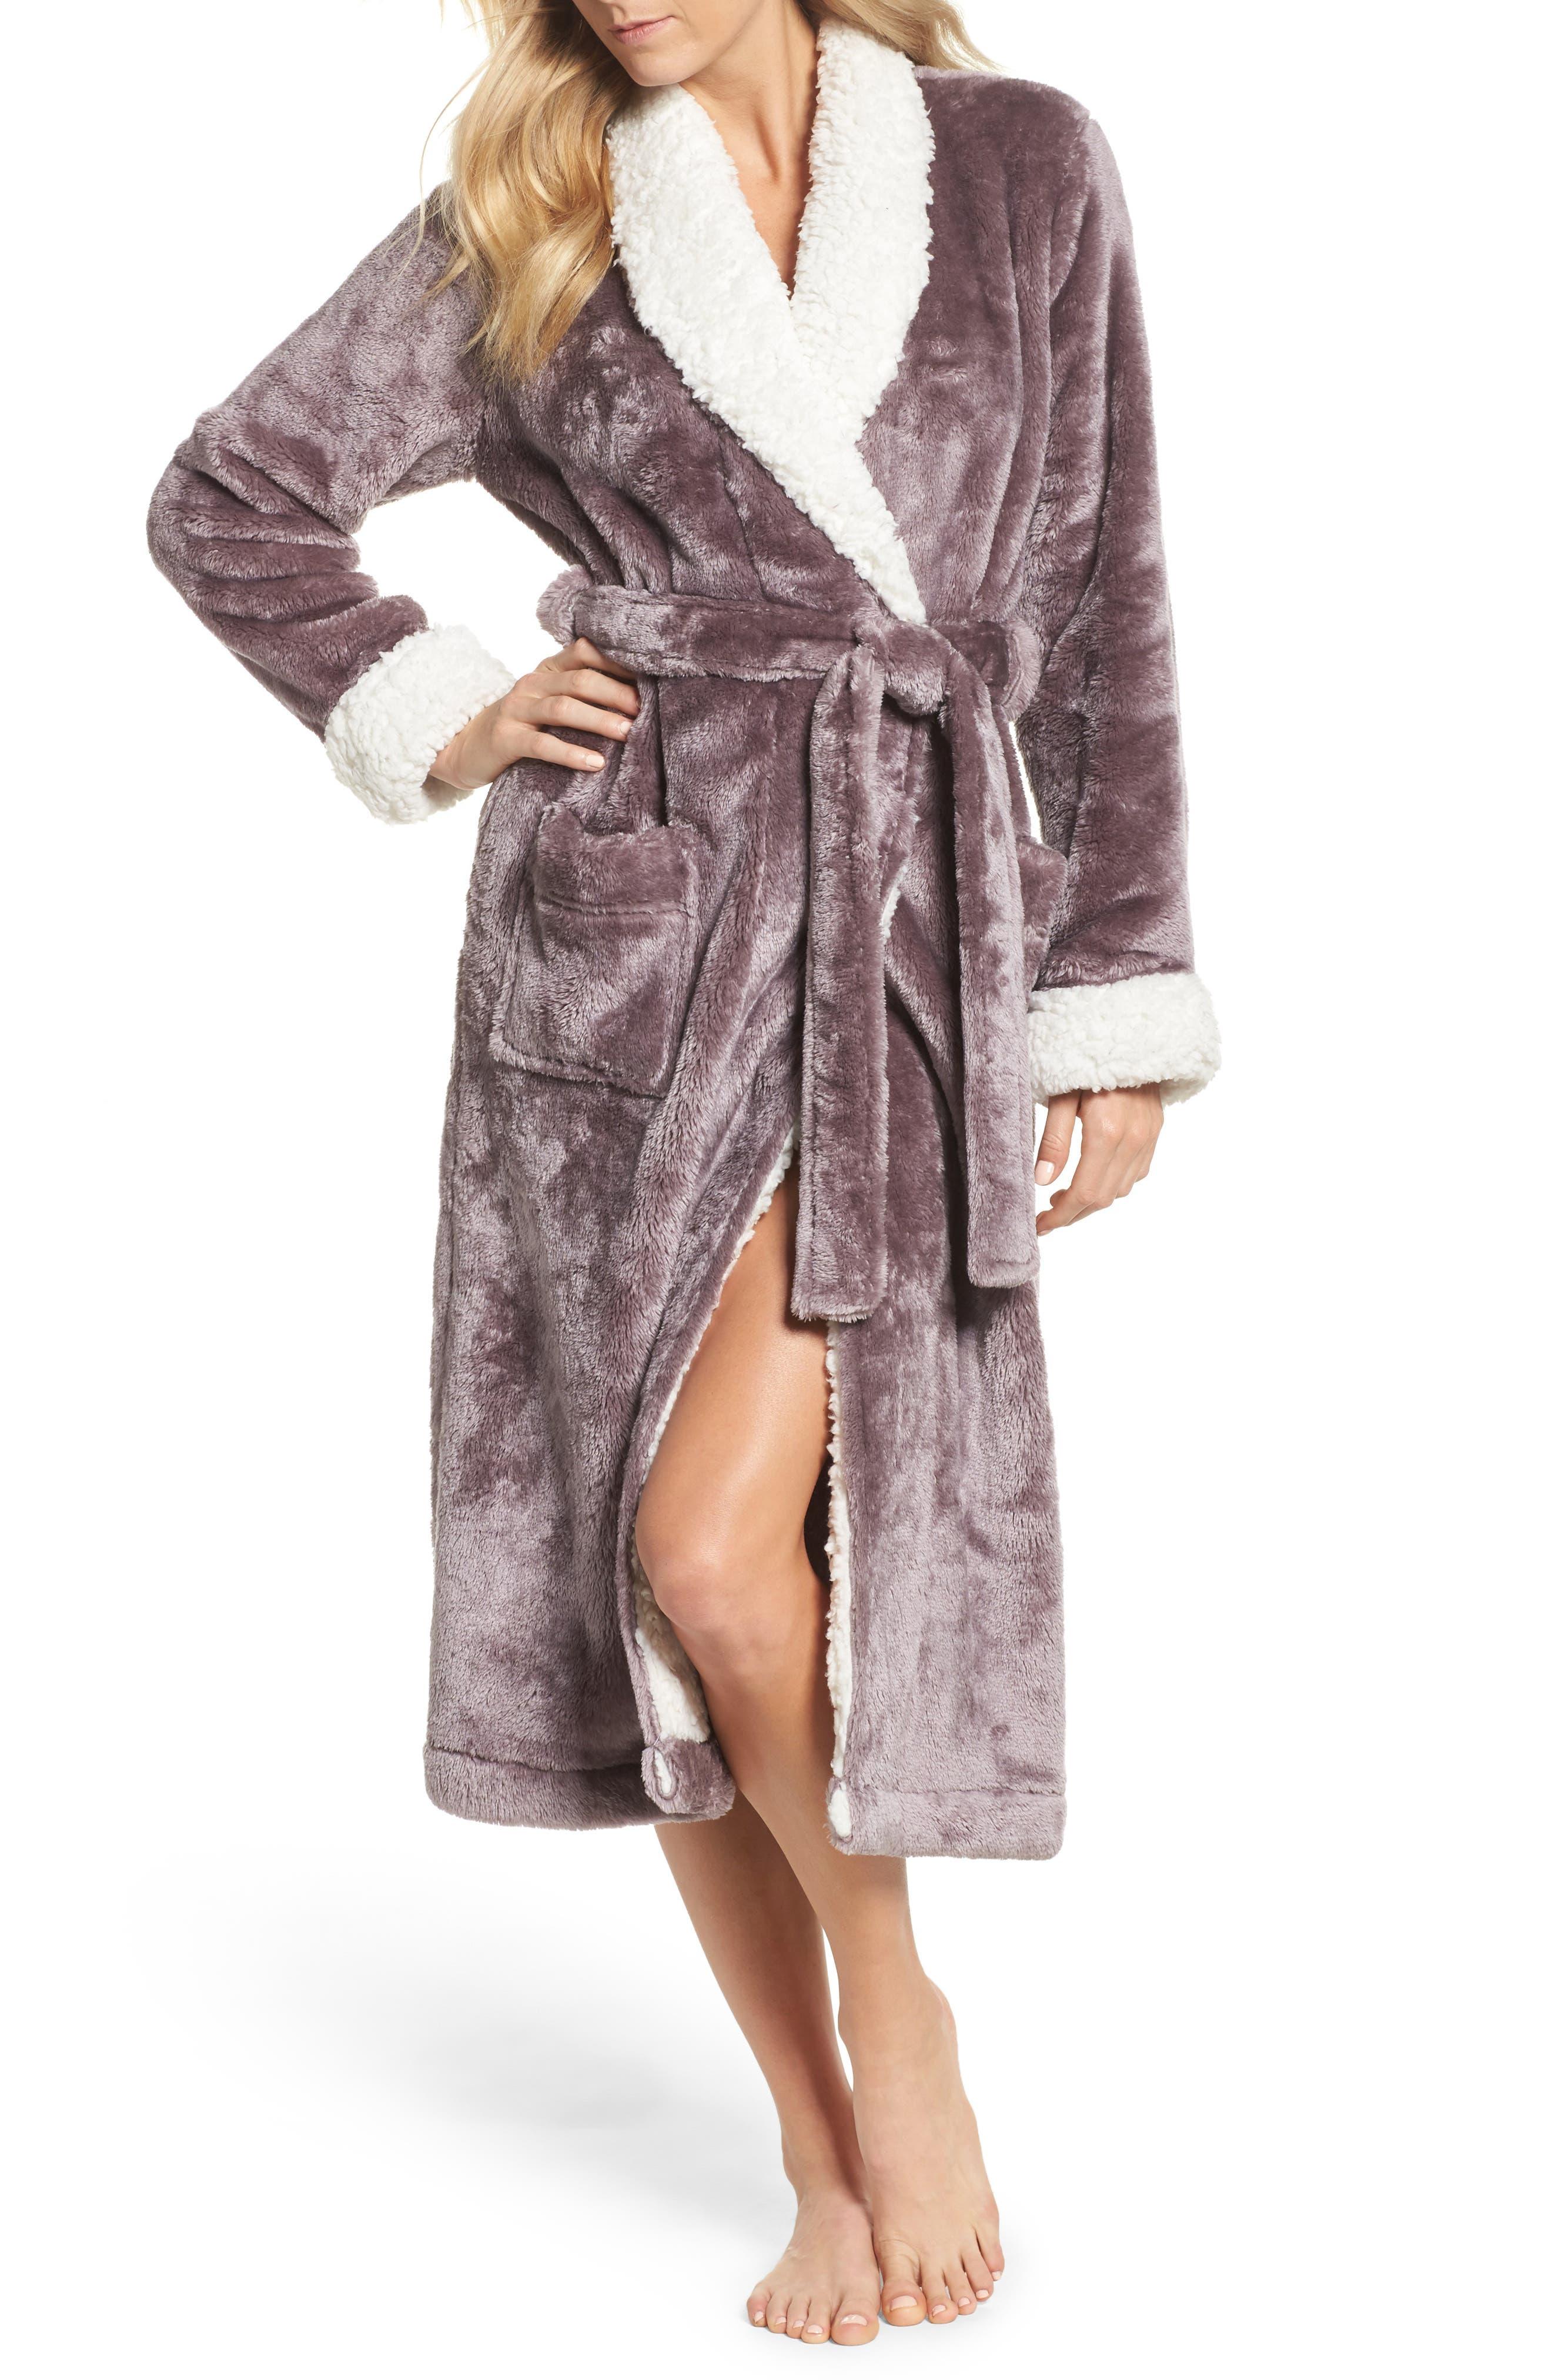 Alternate Image 1 Selected - Nordstrom Lingerie Frosted Plush Robe